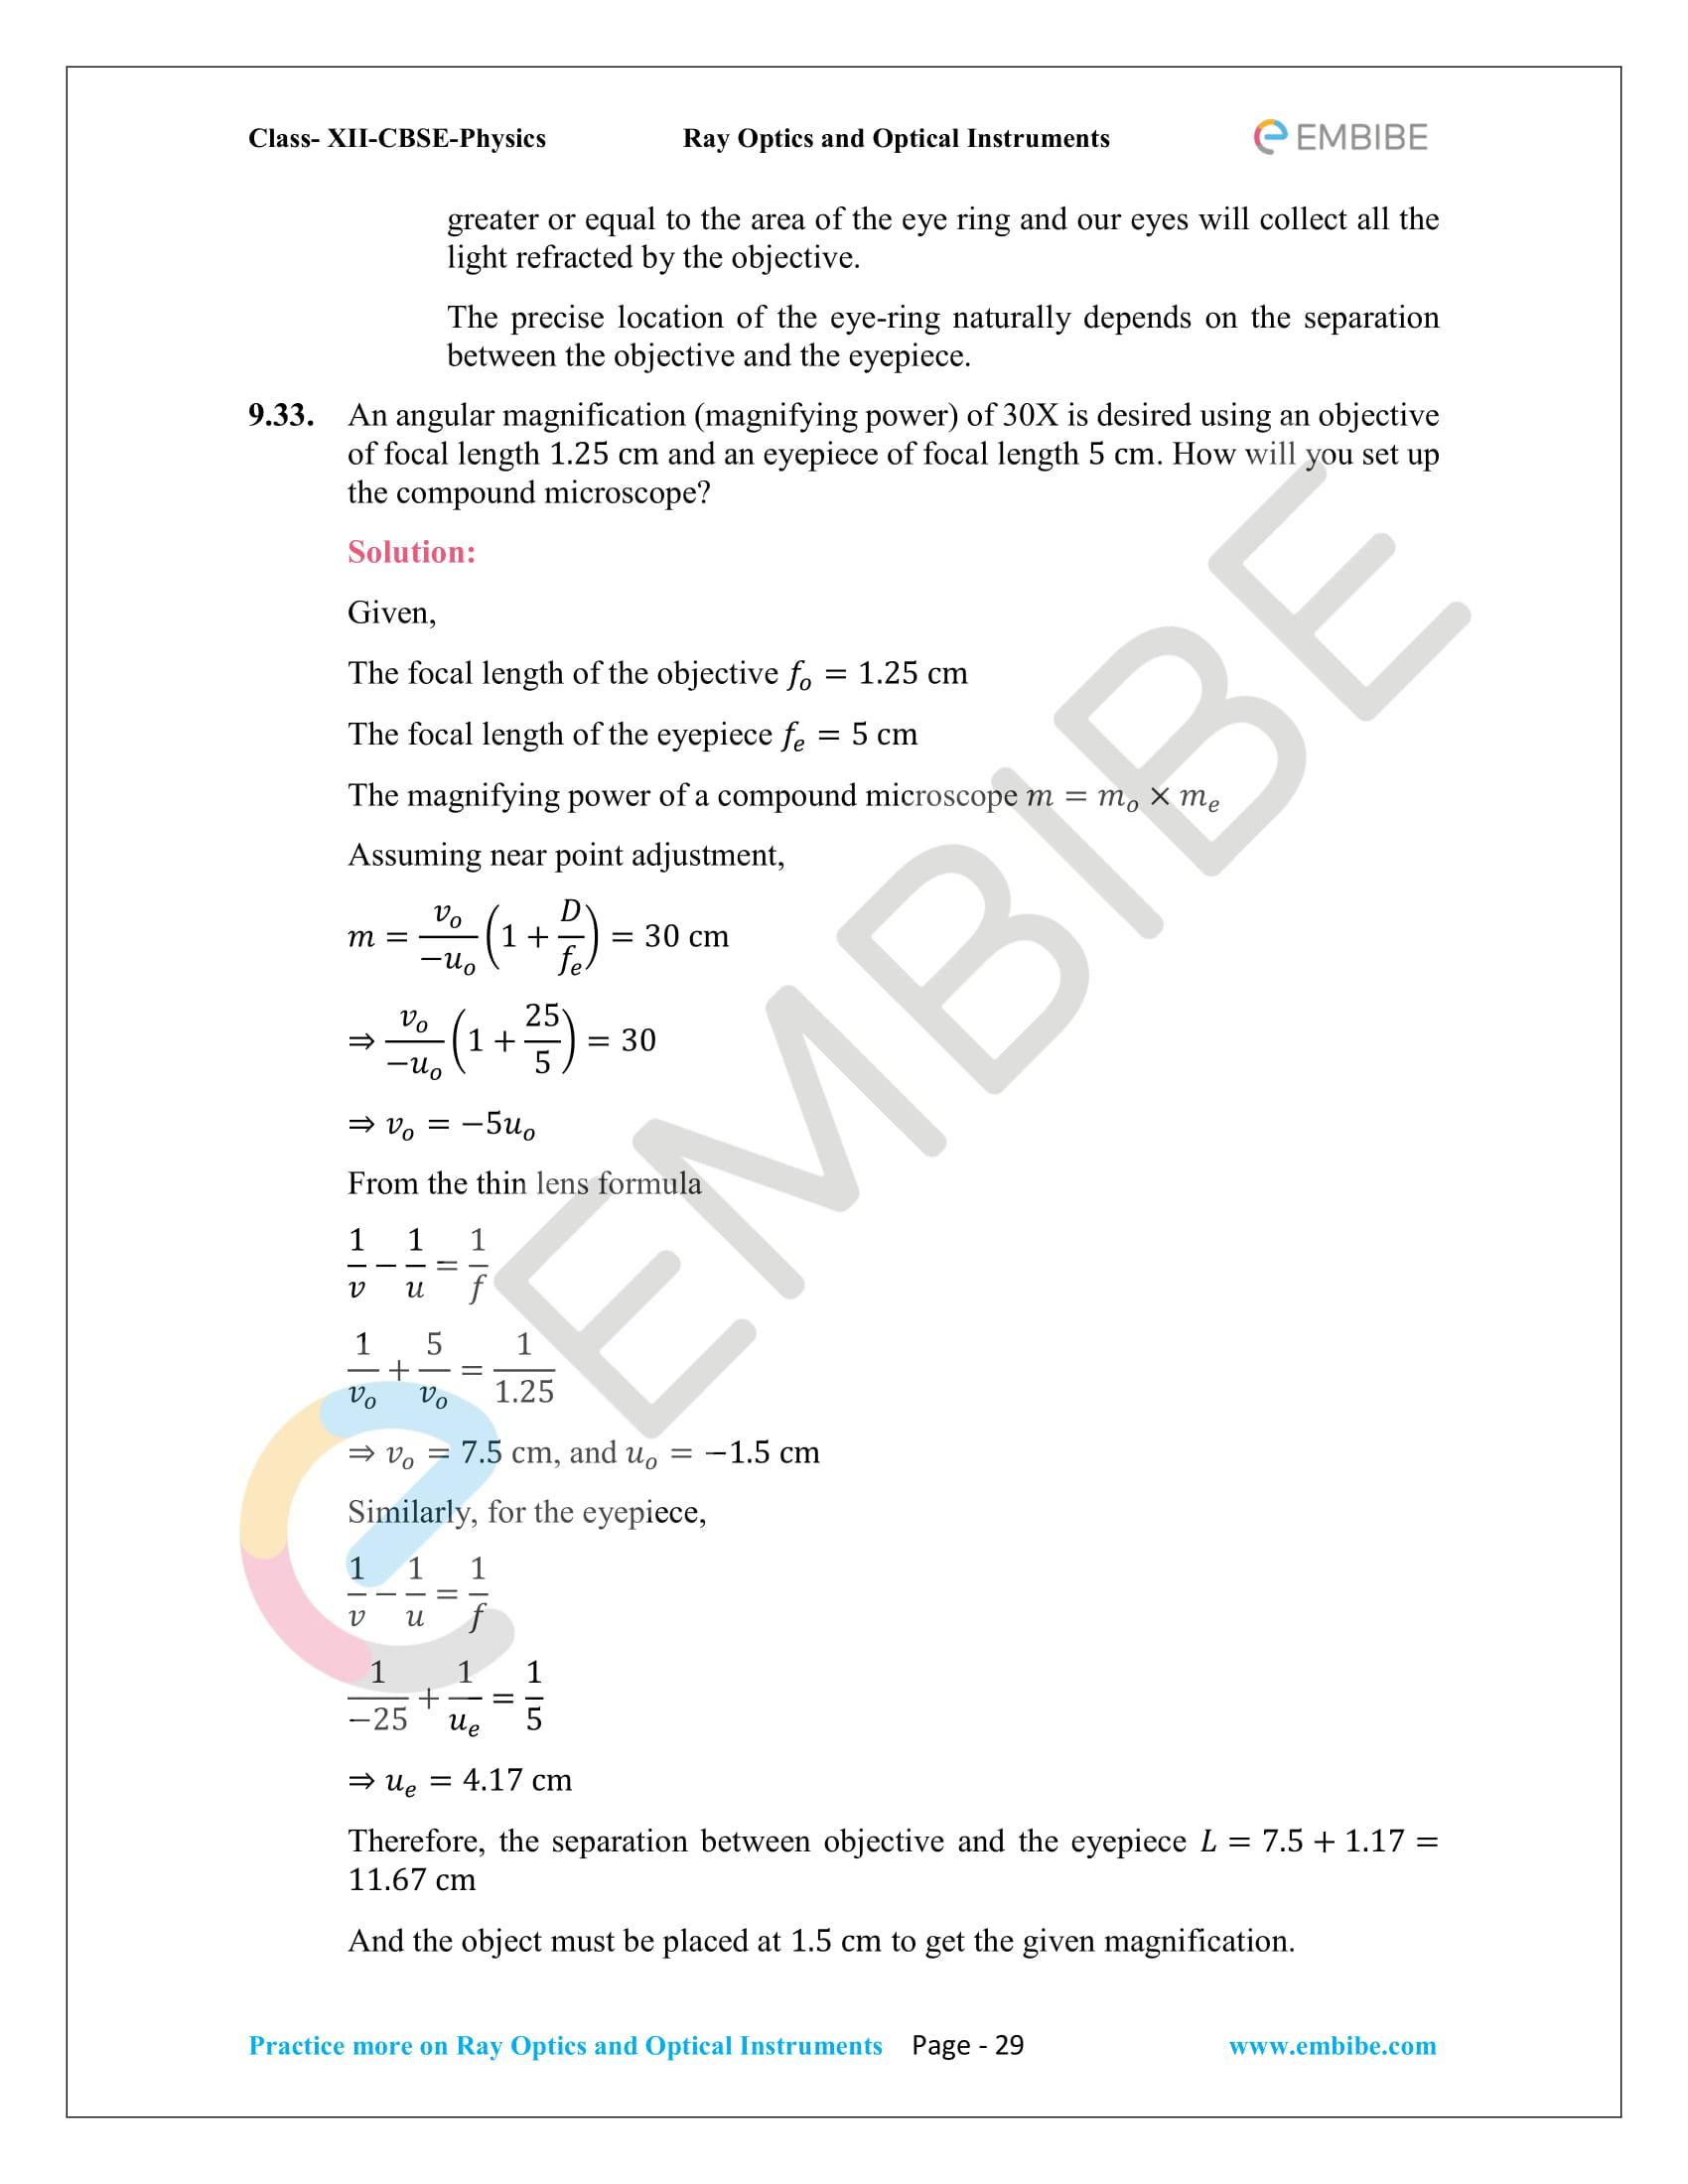 NCERT_Grade 12_Physics_Ch_09_Ray Optics-29